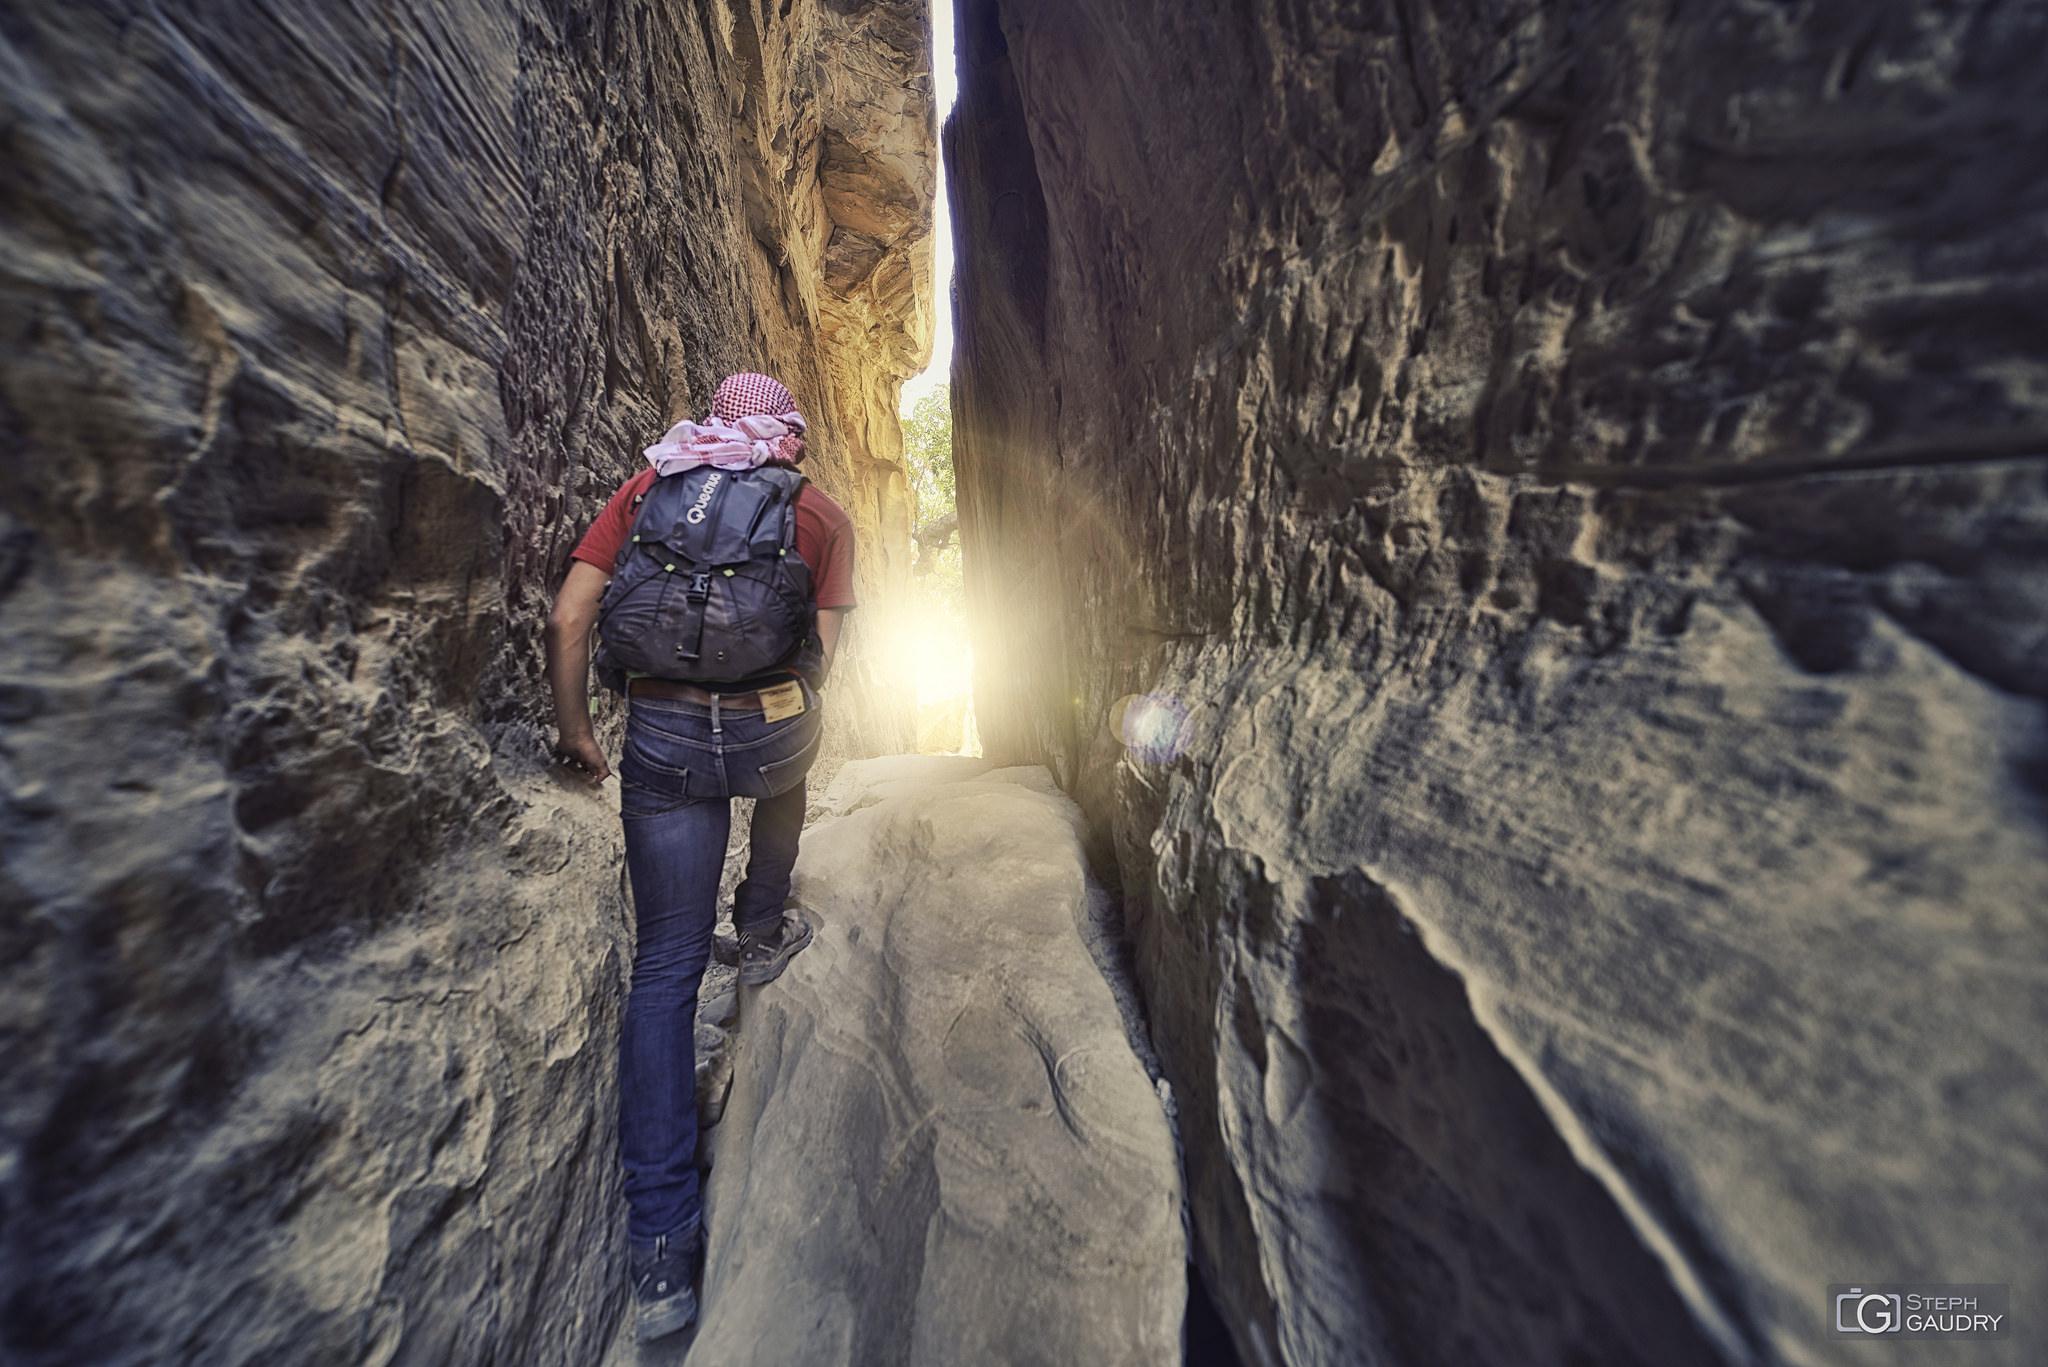 Hiking in Jordan with my son Tom [Cliquez pour lancer le diaporama]